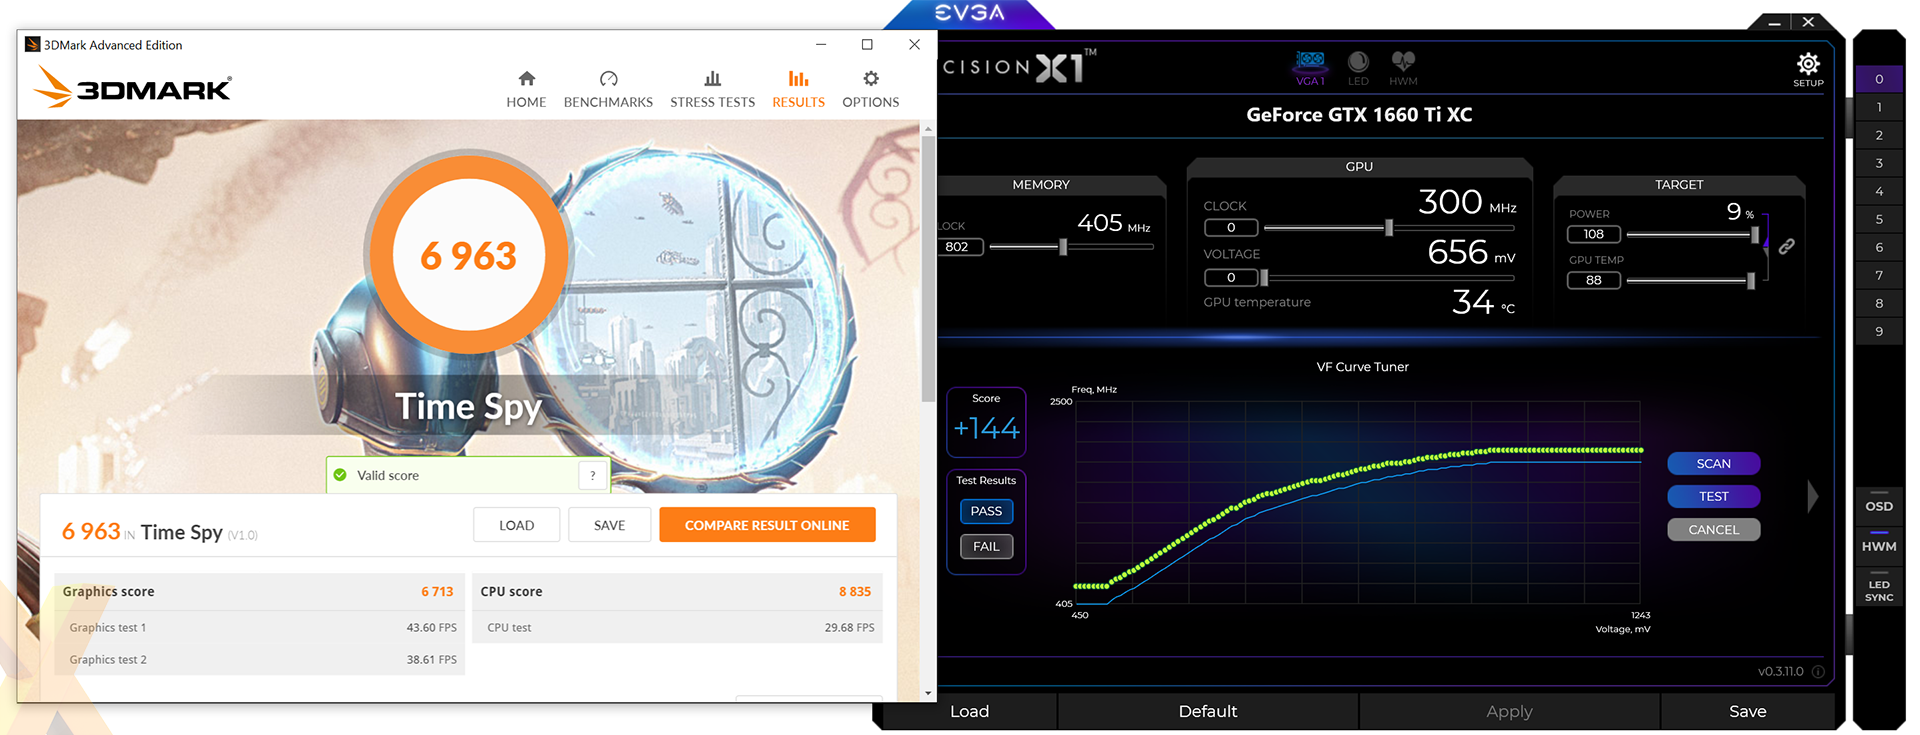 Review: Palit GeForce GTX 1660 Ti StormX - Graphics - HEXUS net